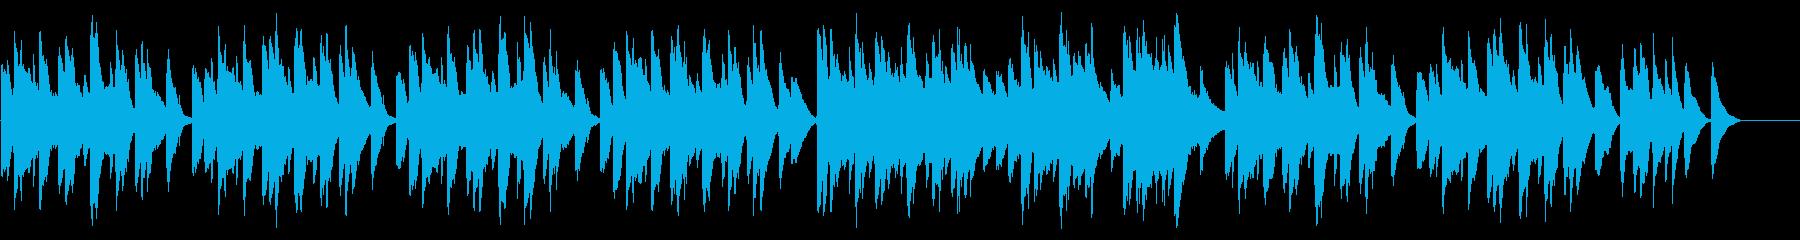 SNS広告 ピアノメイン かわいいの再生済みの波形